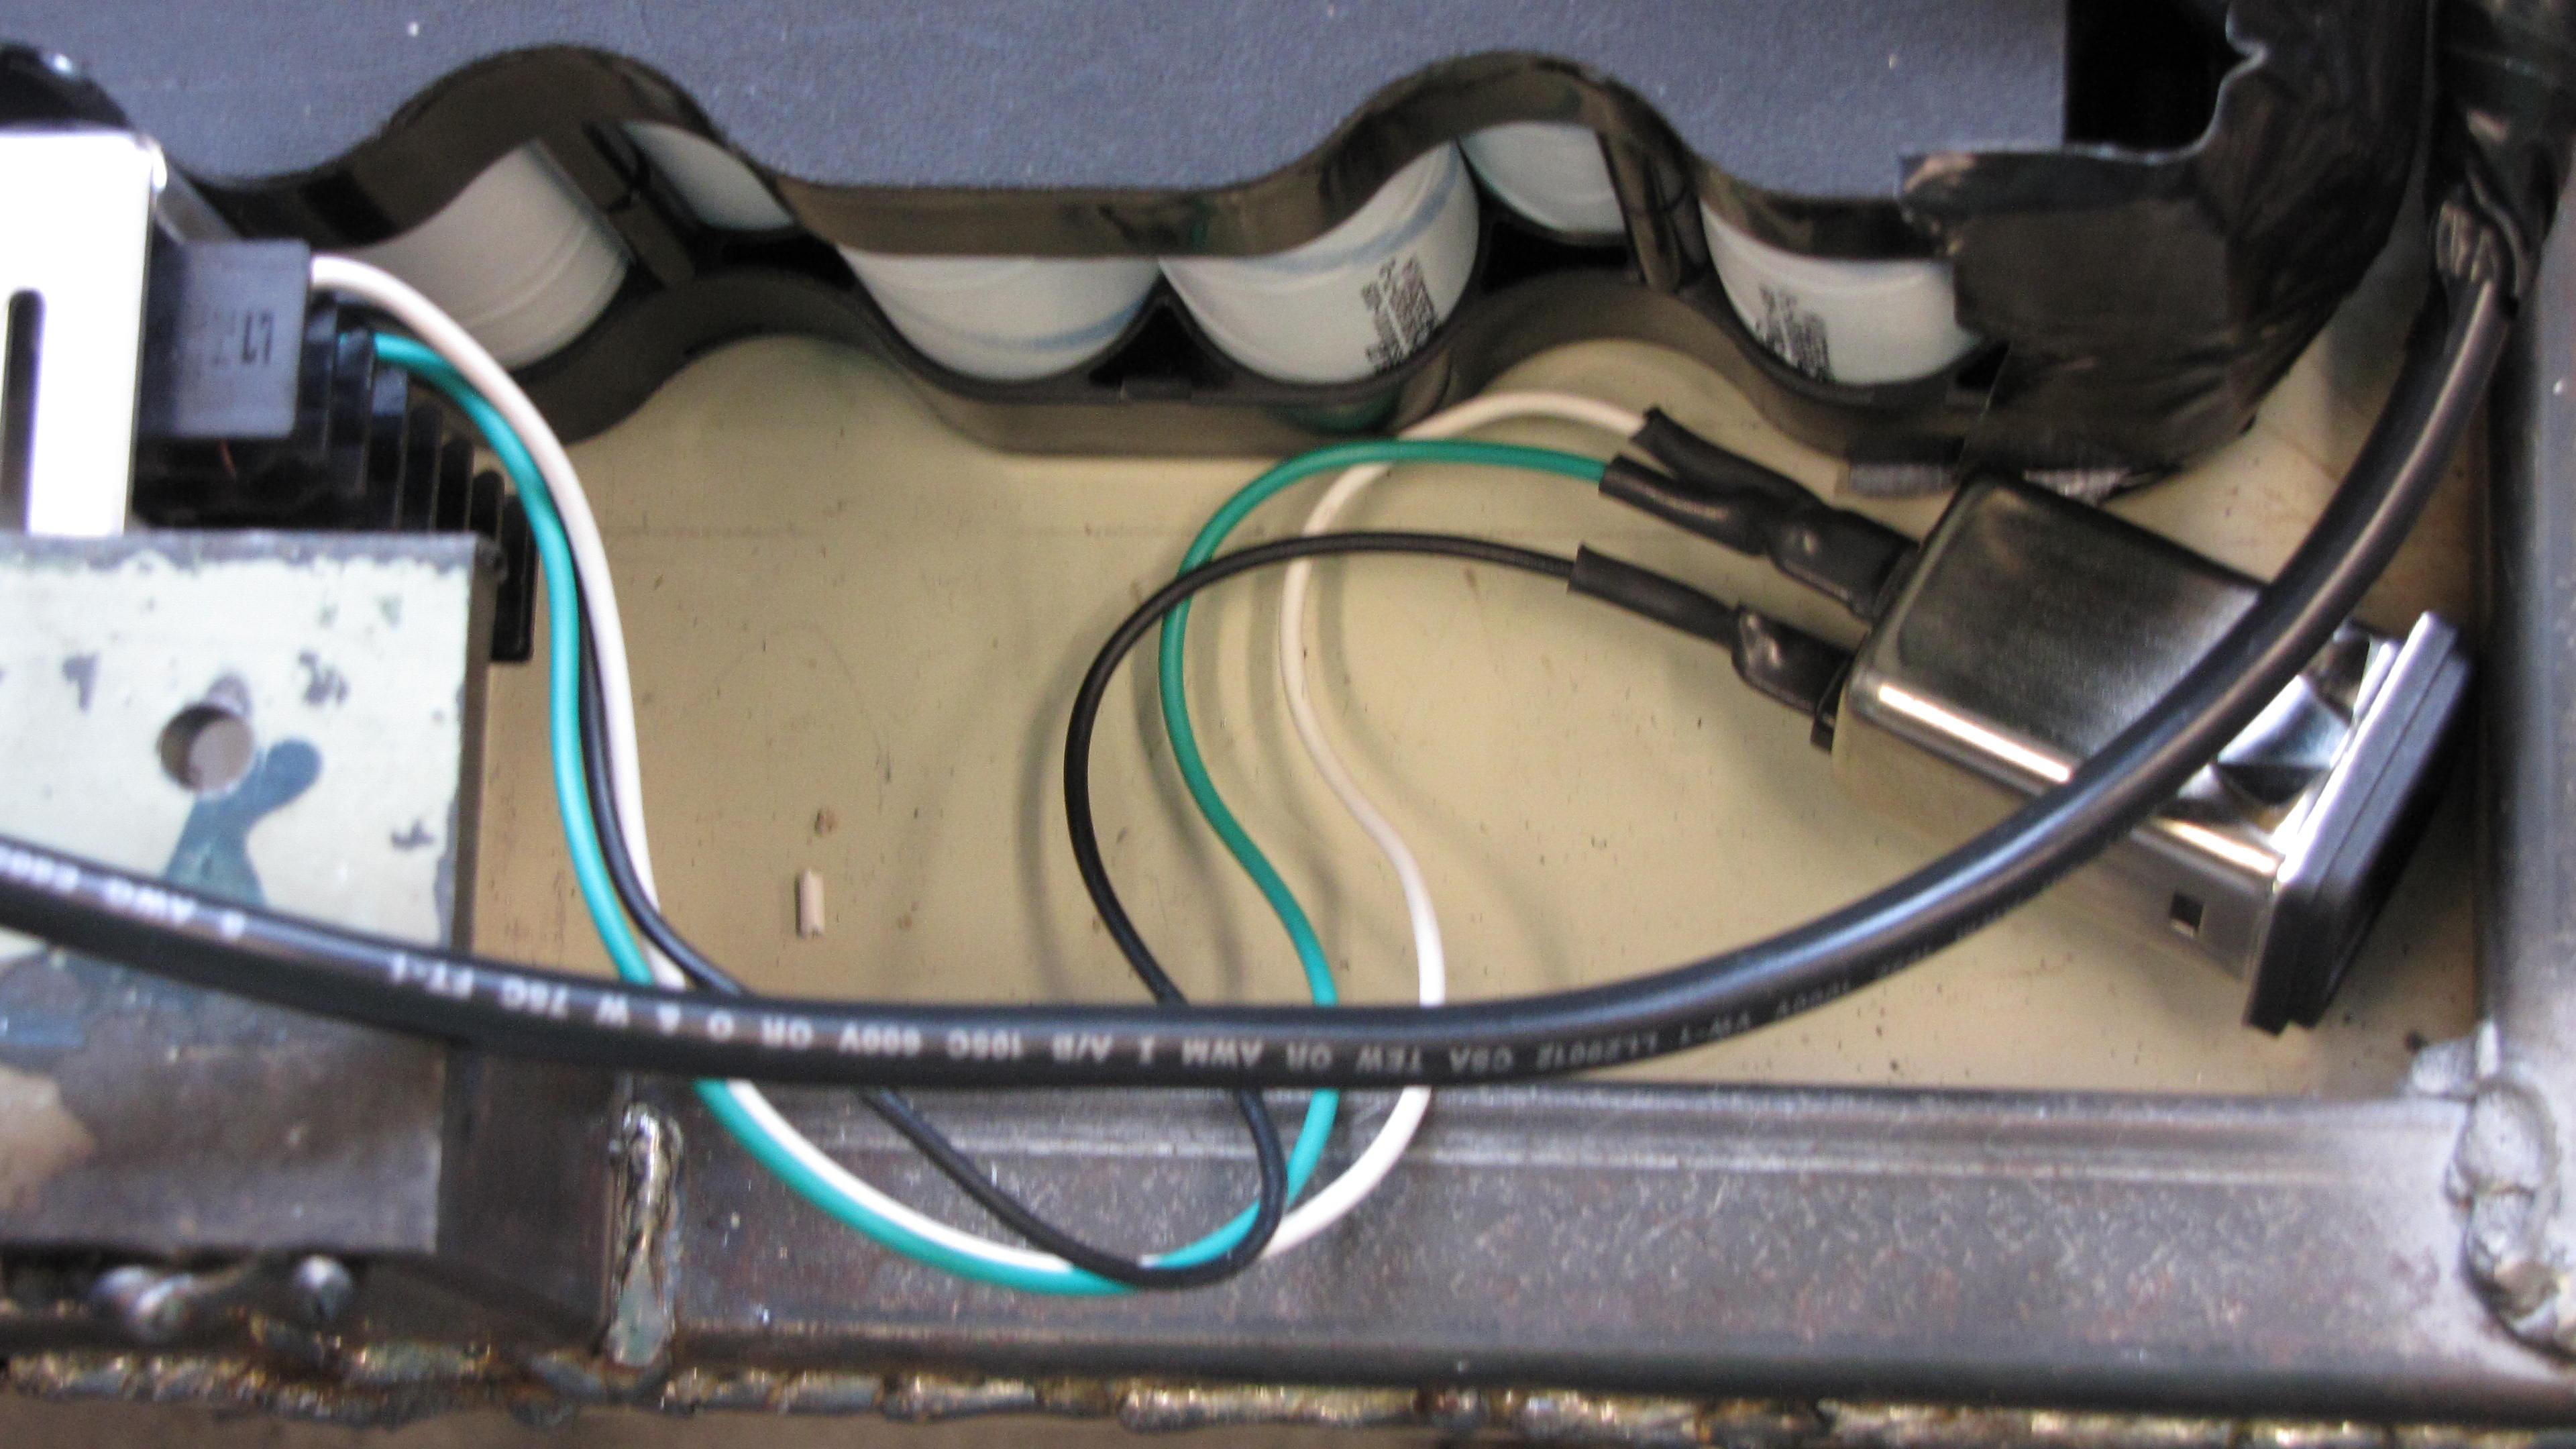 120 volt connector